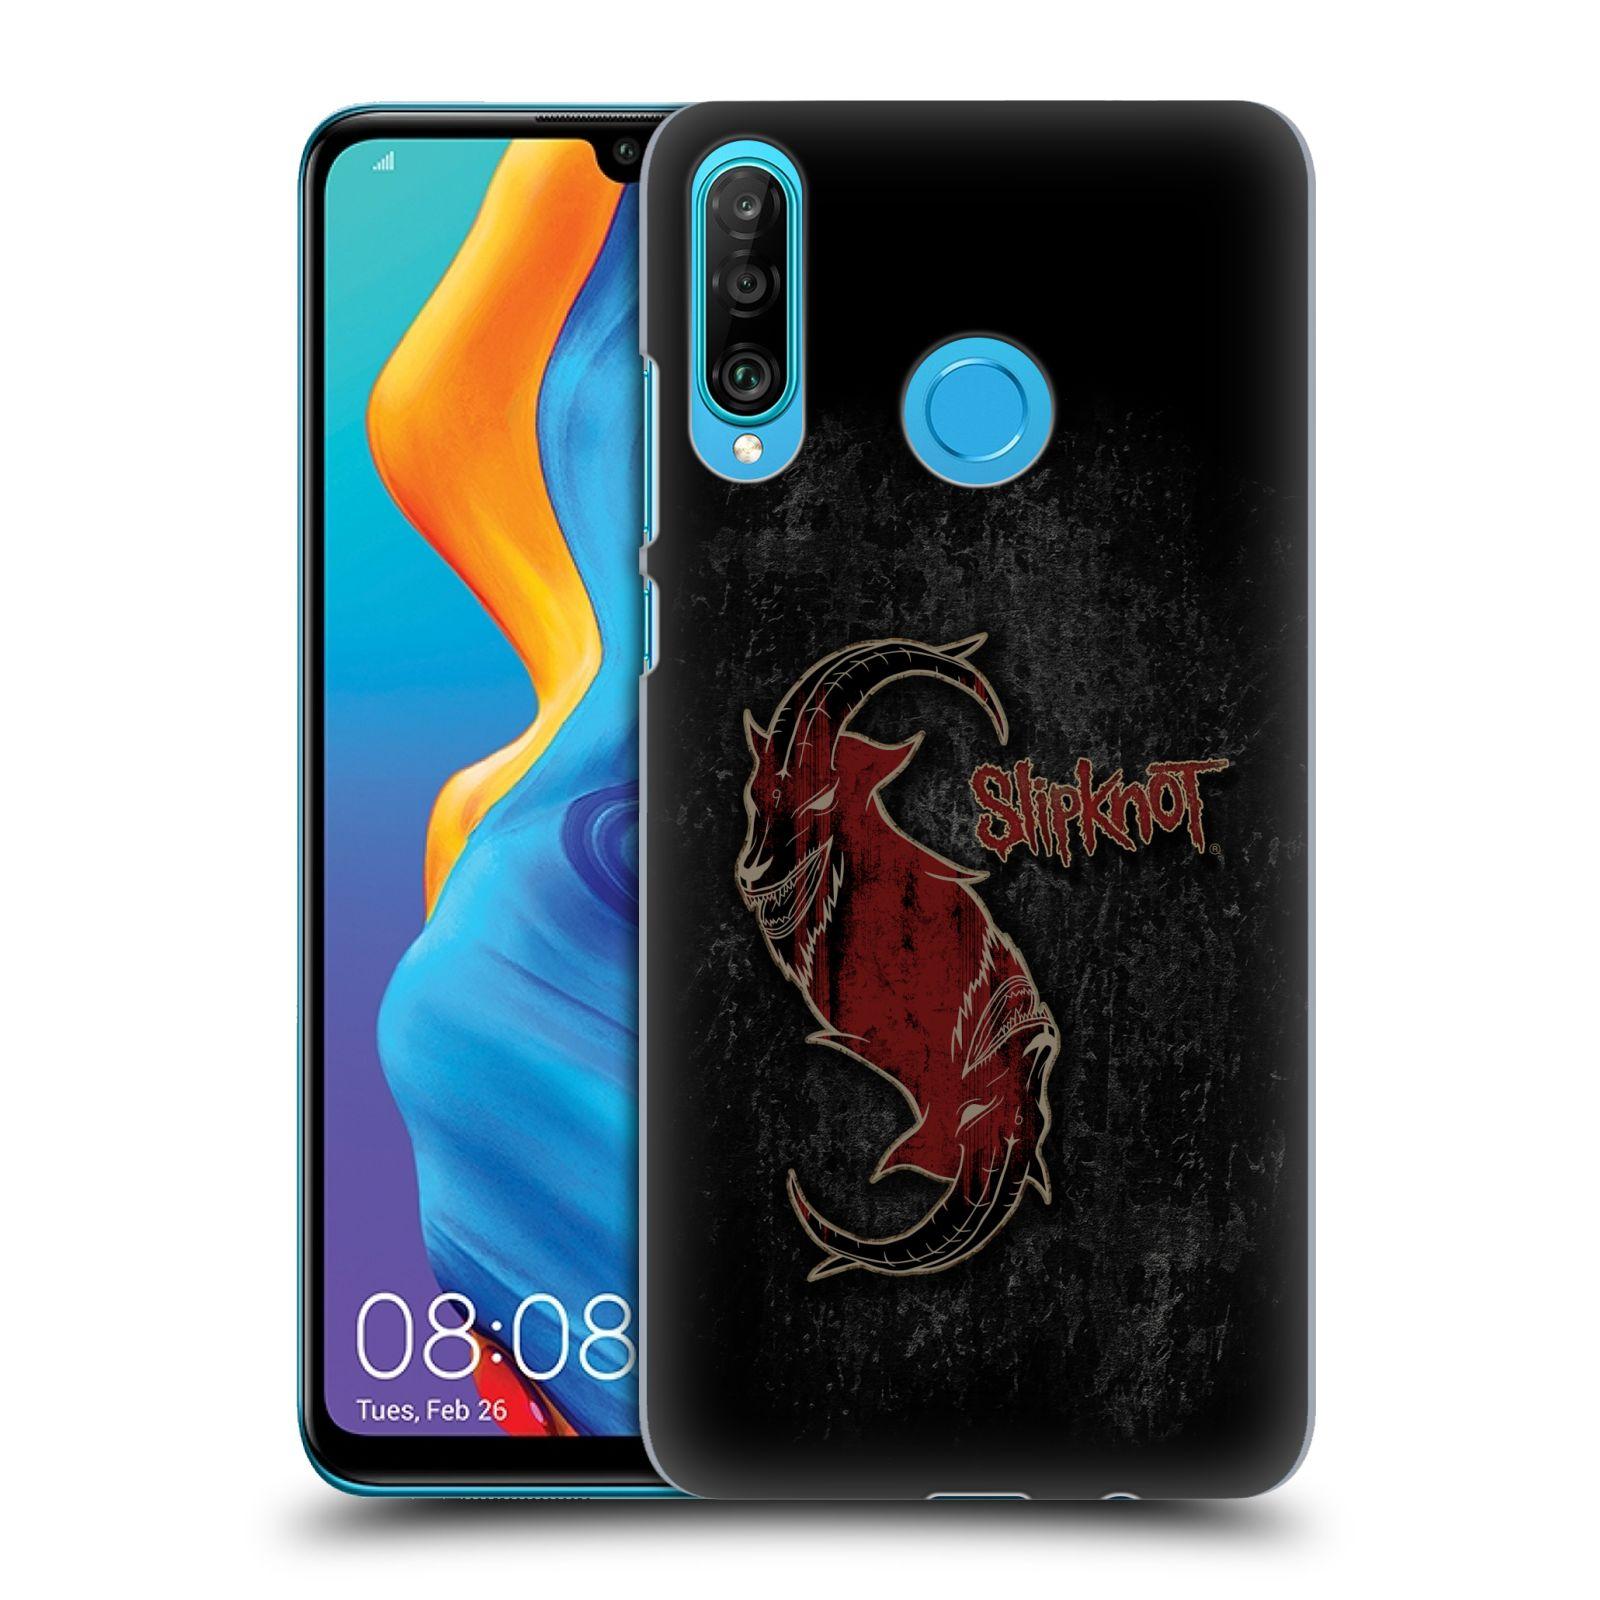 Plastové pouzdro na mobil Huawei P30 Lite - Head Case - Slipknot - Rudý kozel